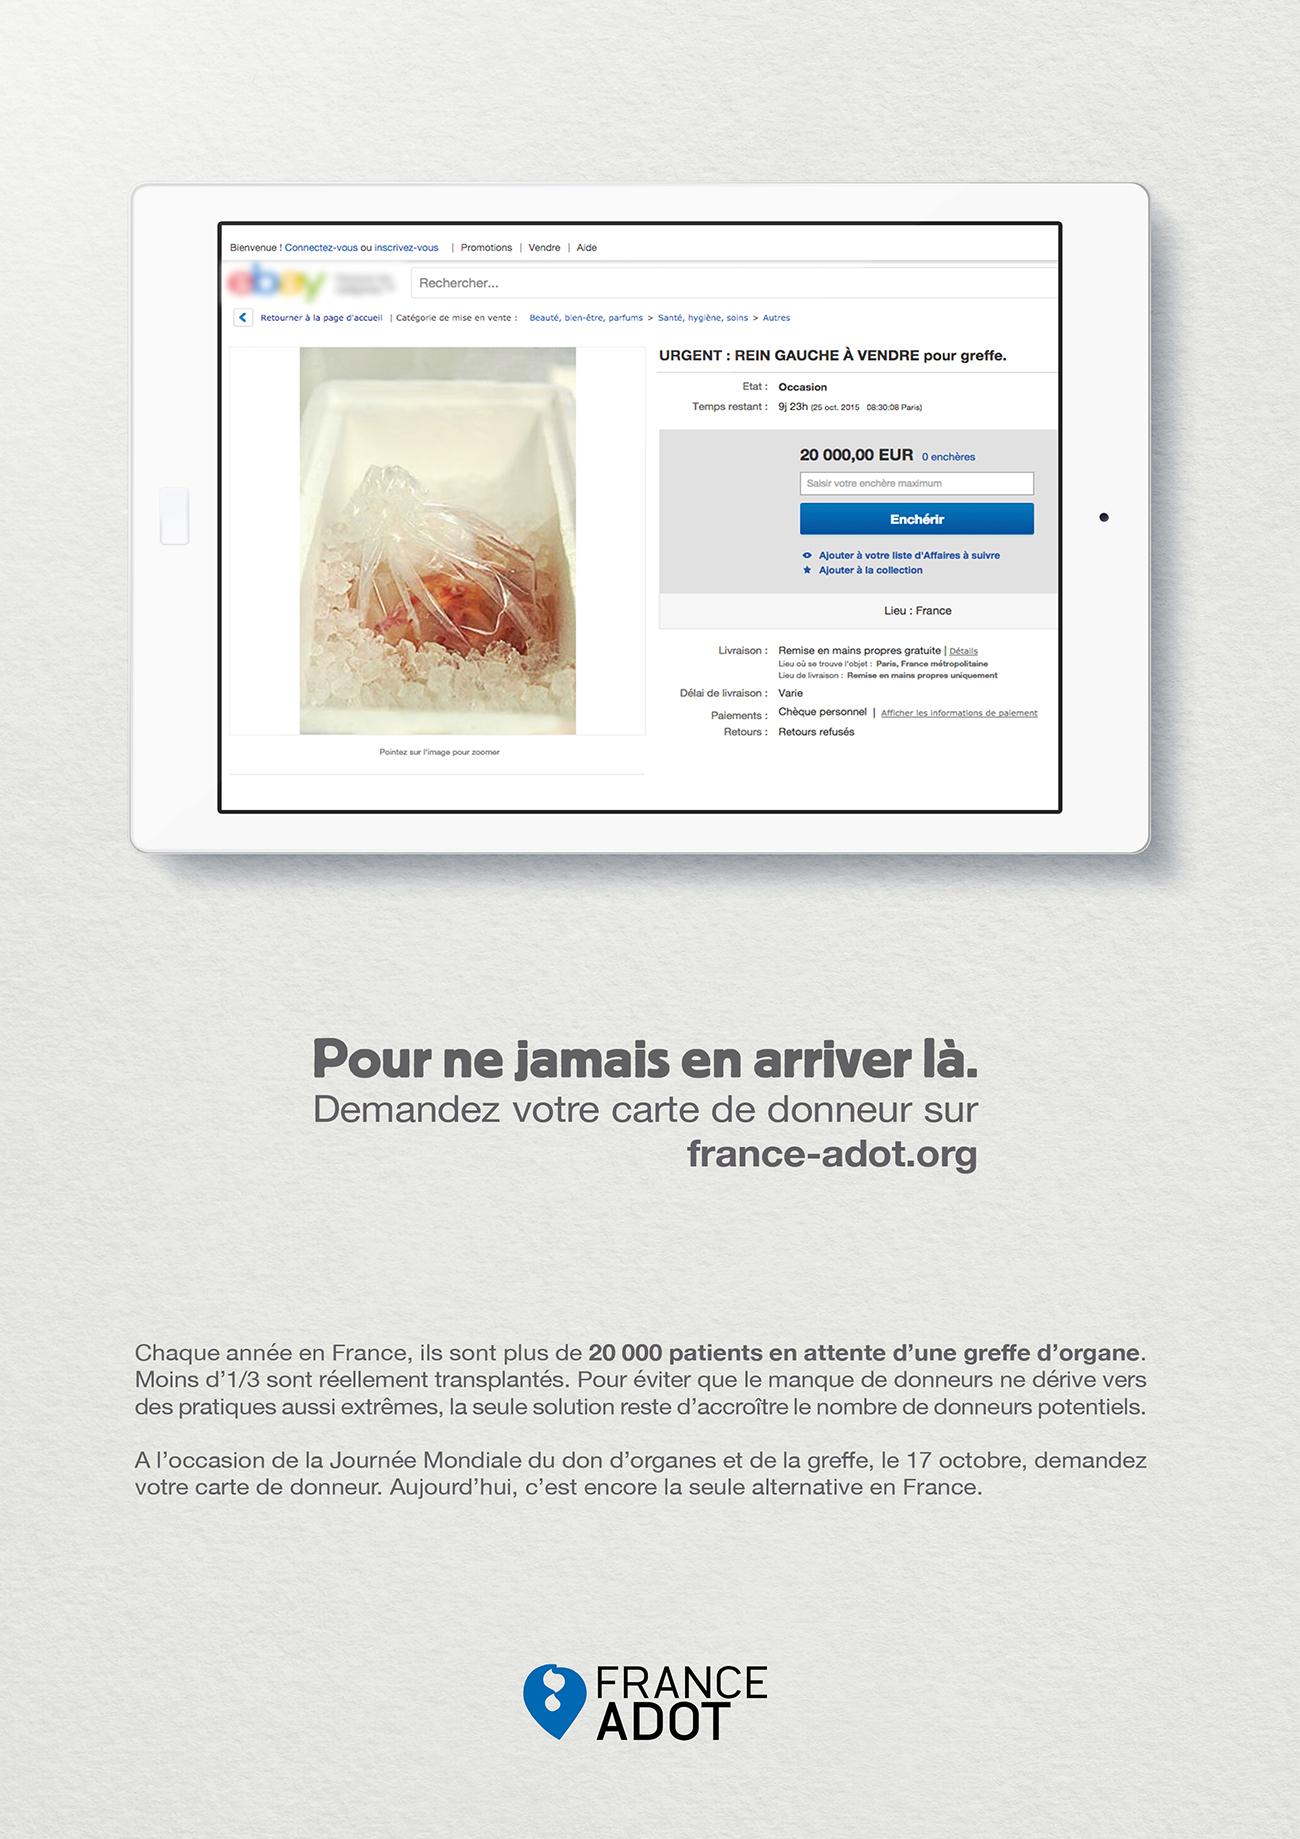 france-adot-don-organes-tissus-greffe-annonce-ebay-rein-carte-donneur-agence-fcb-paris-2